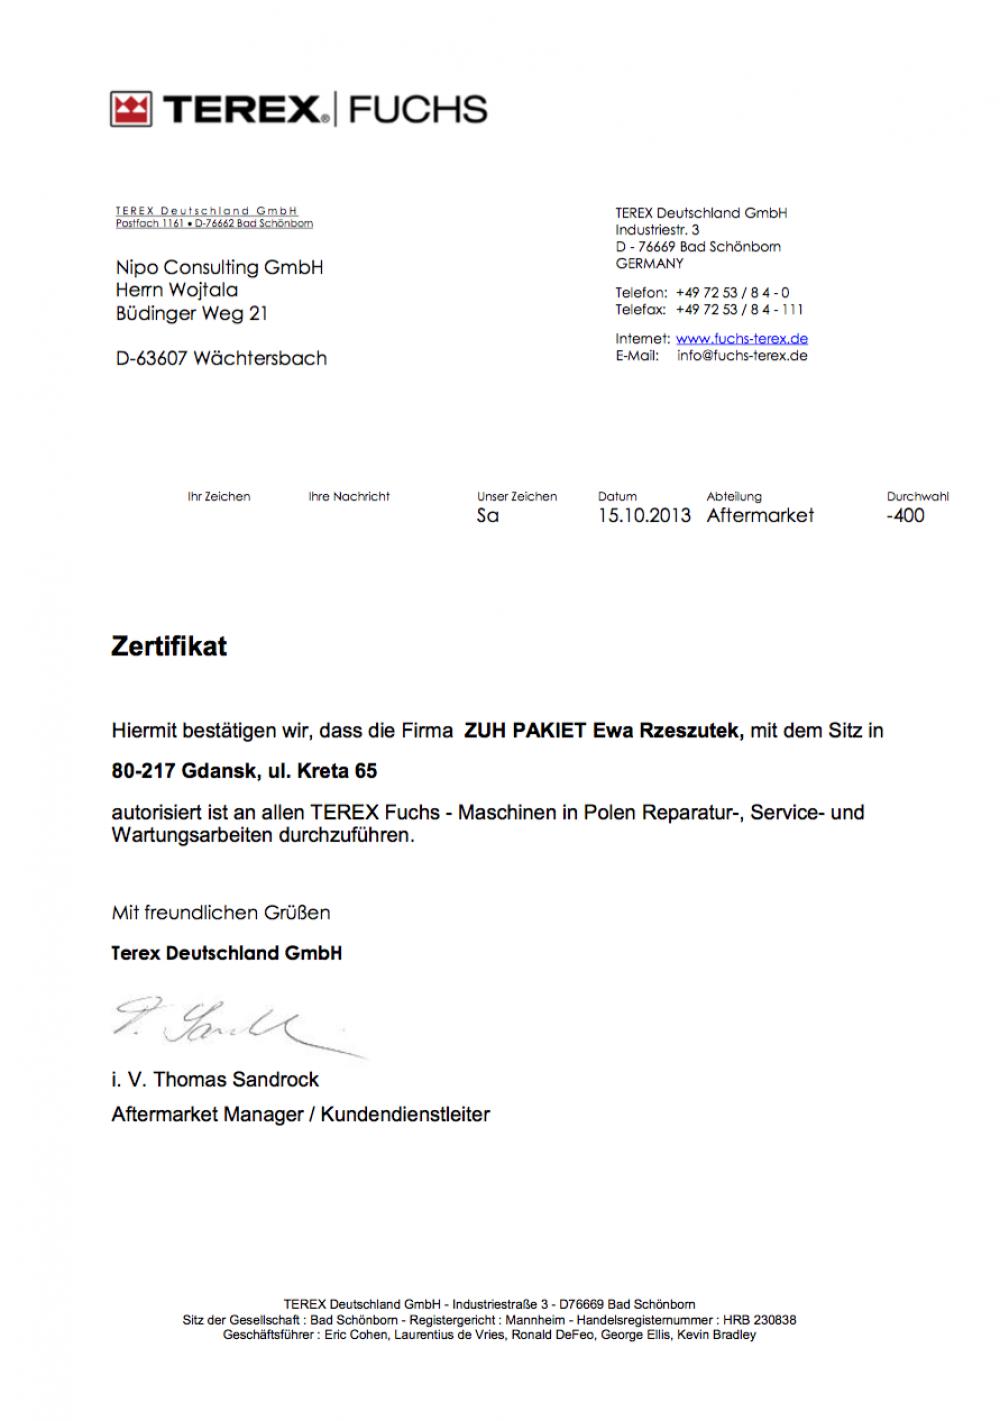 Certyfikat_TEREX-FUCHS.png